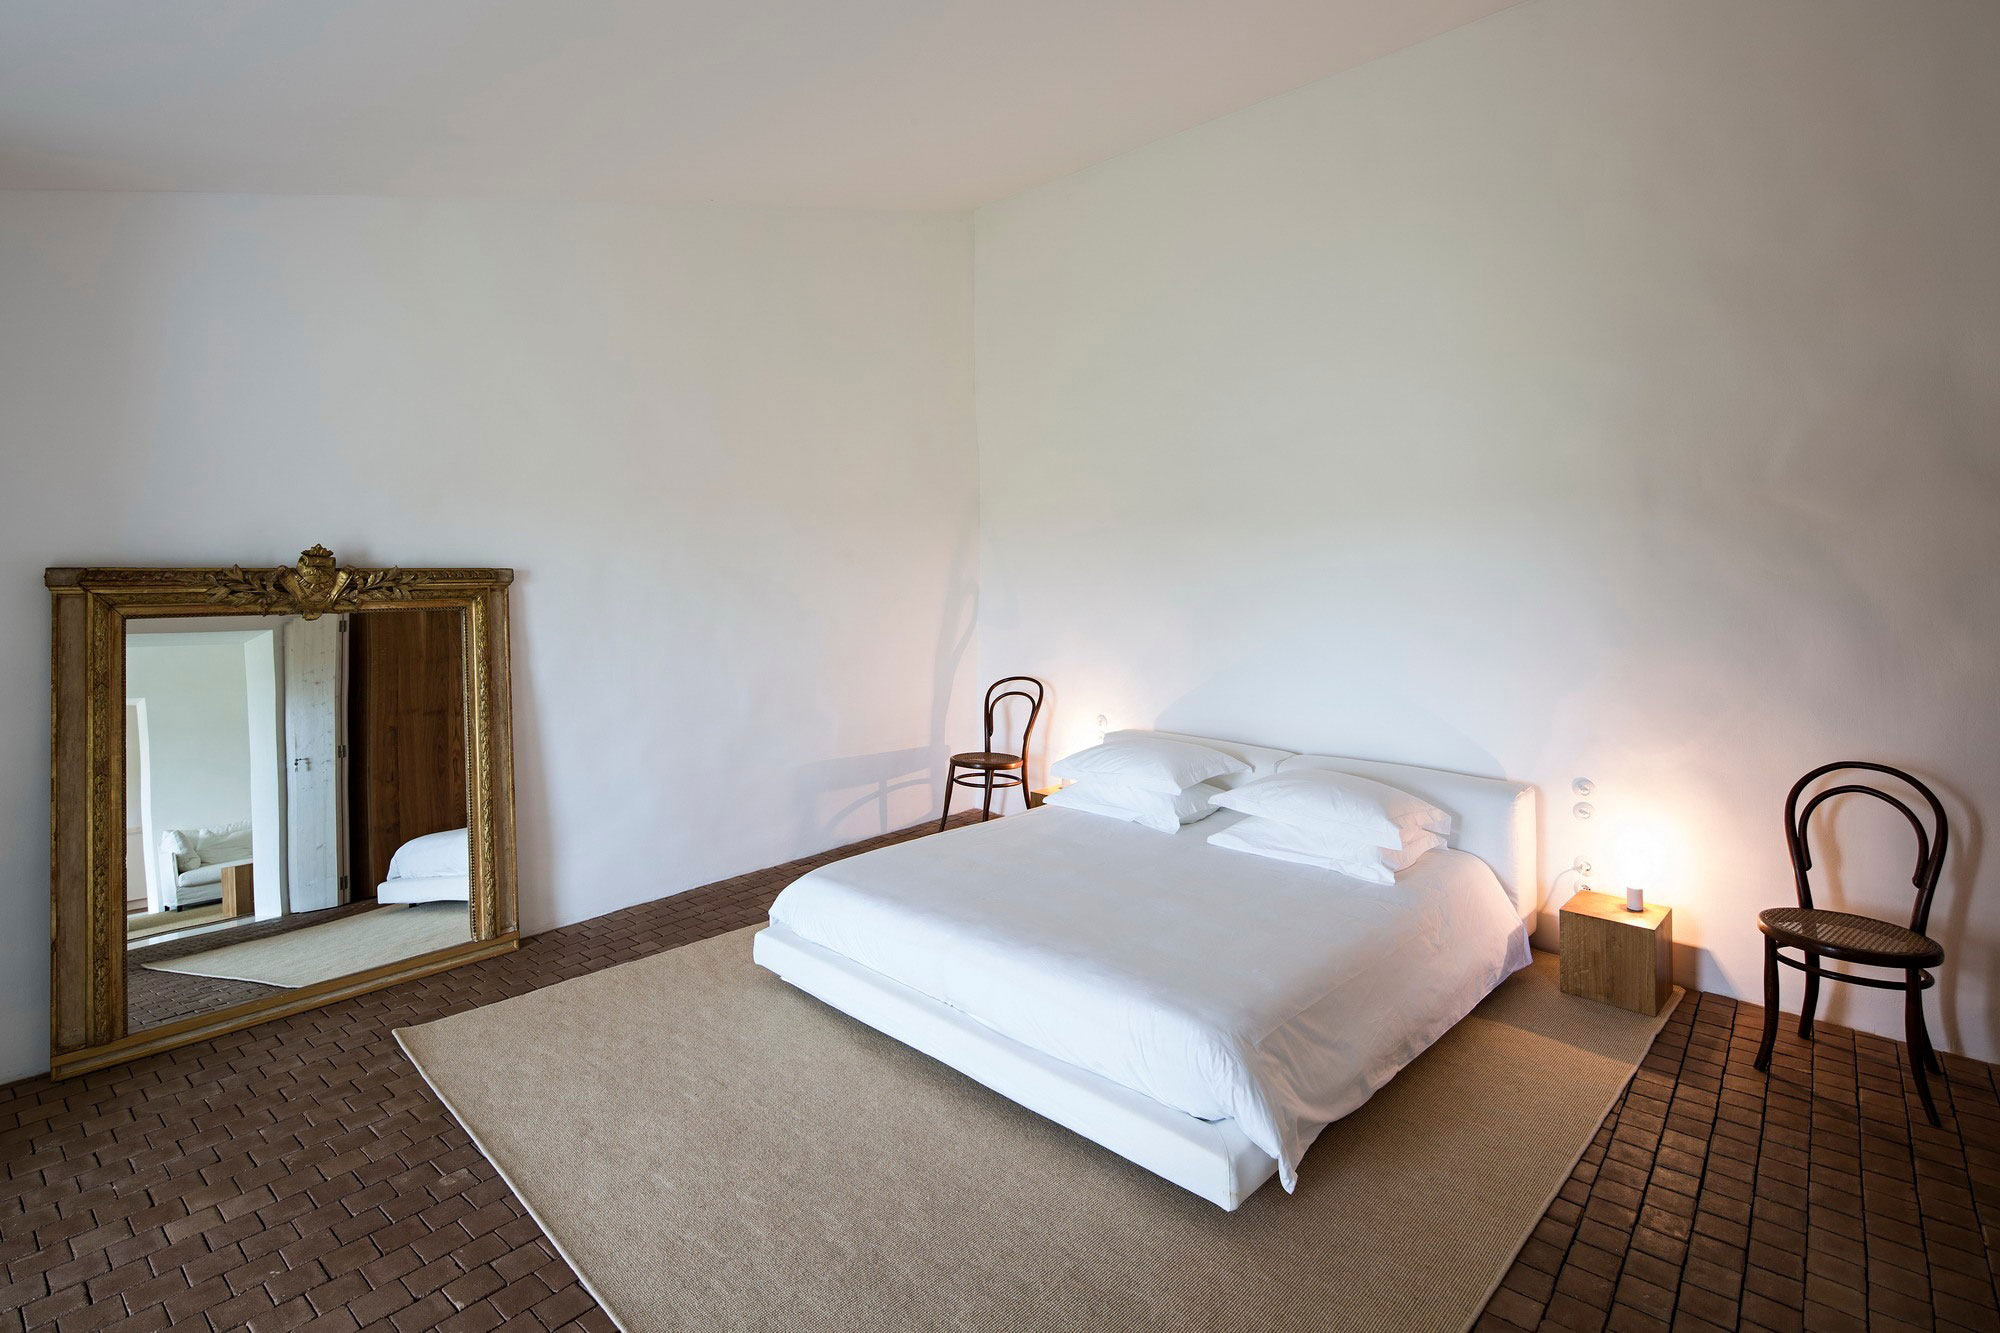 Gold Mirror, Rug, Bedroom